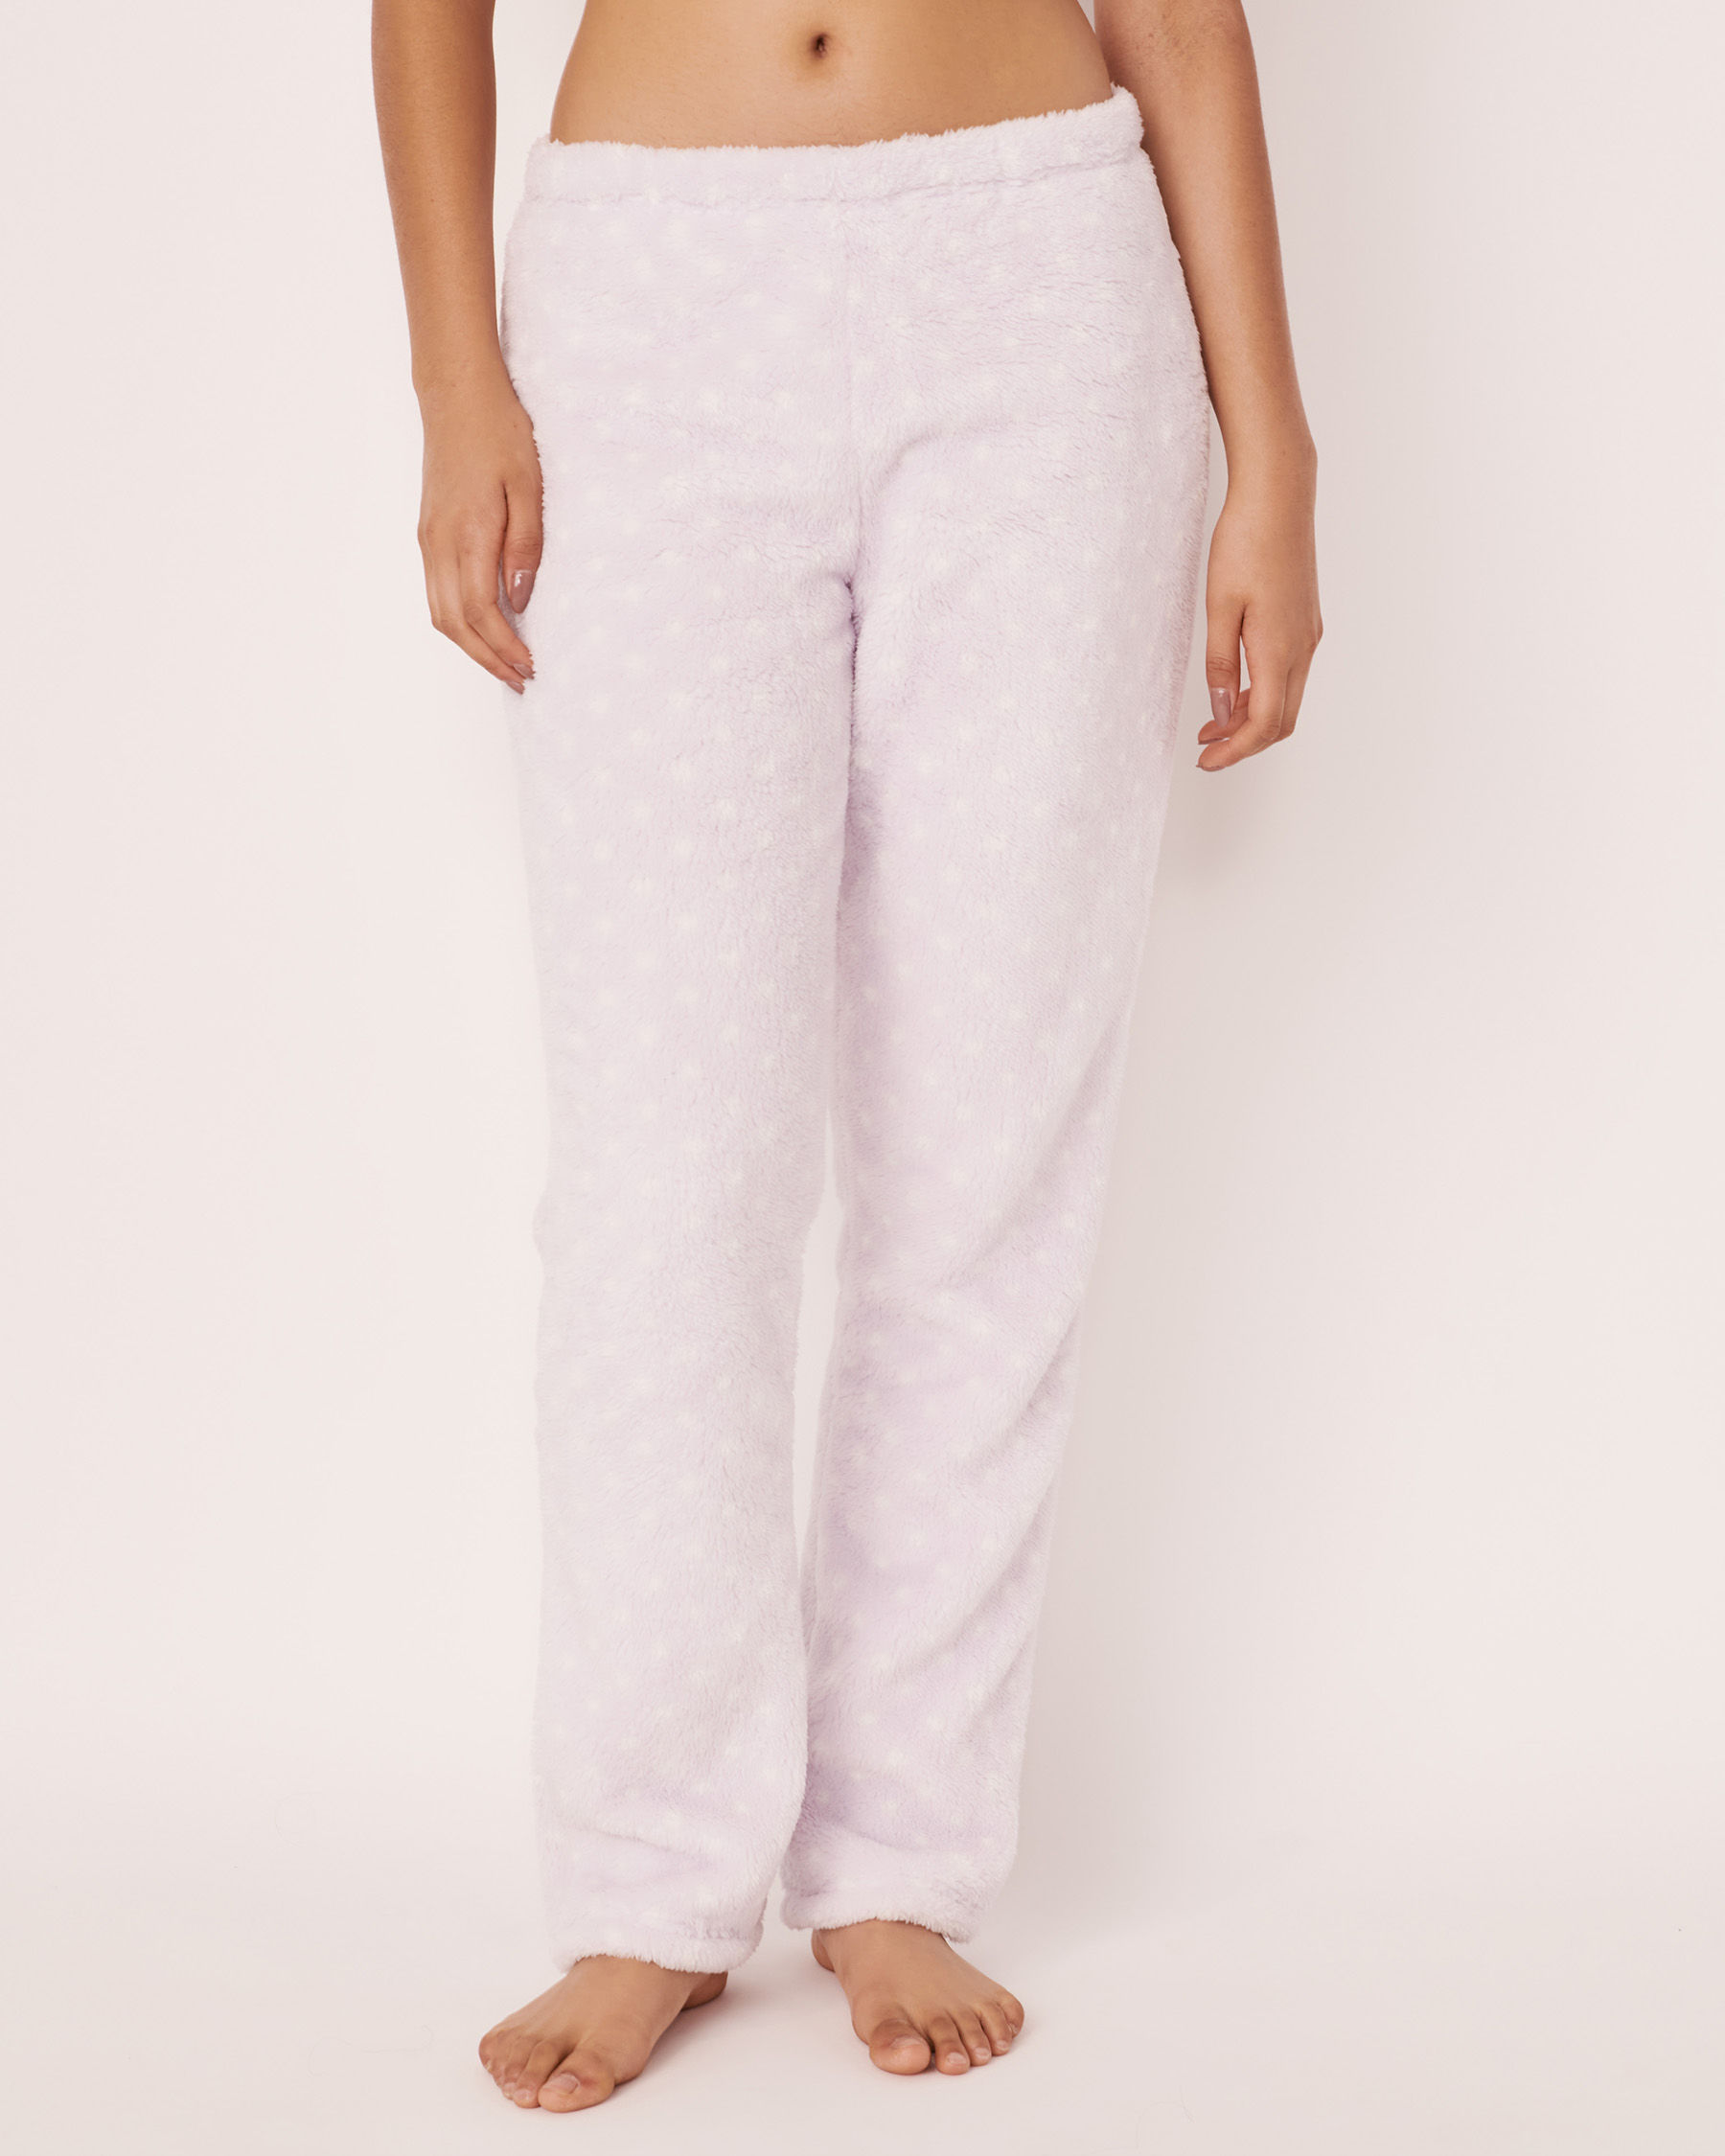 LA VIE EN ROSE Ensemble pyjama mouton 3D Blanc 40400009 - Voir4